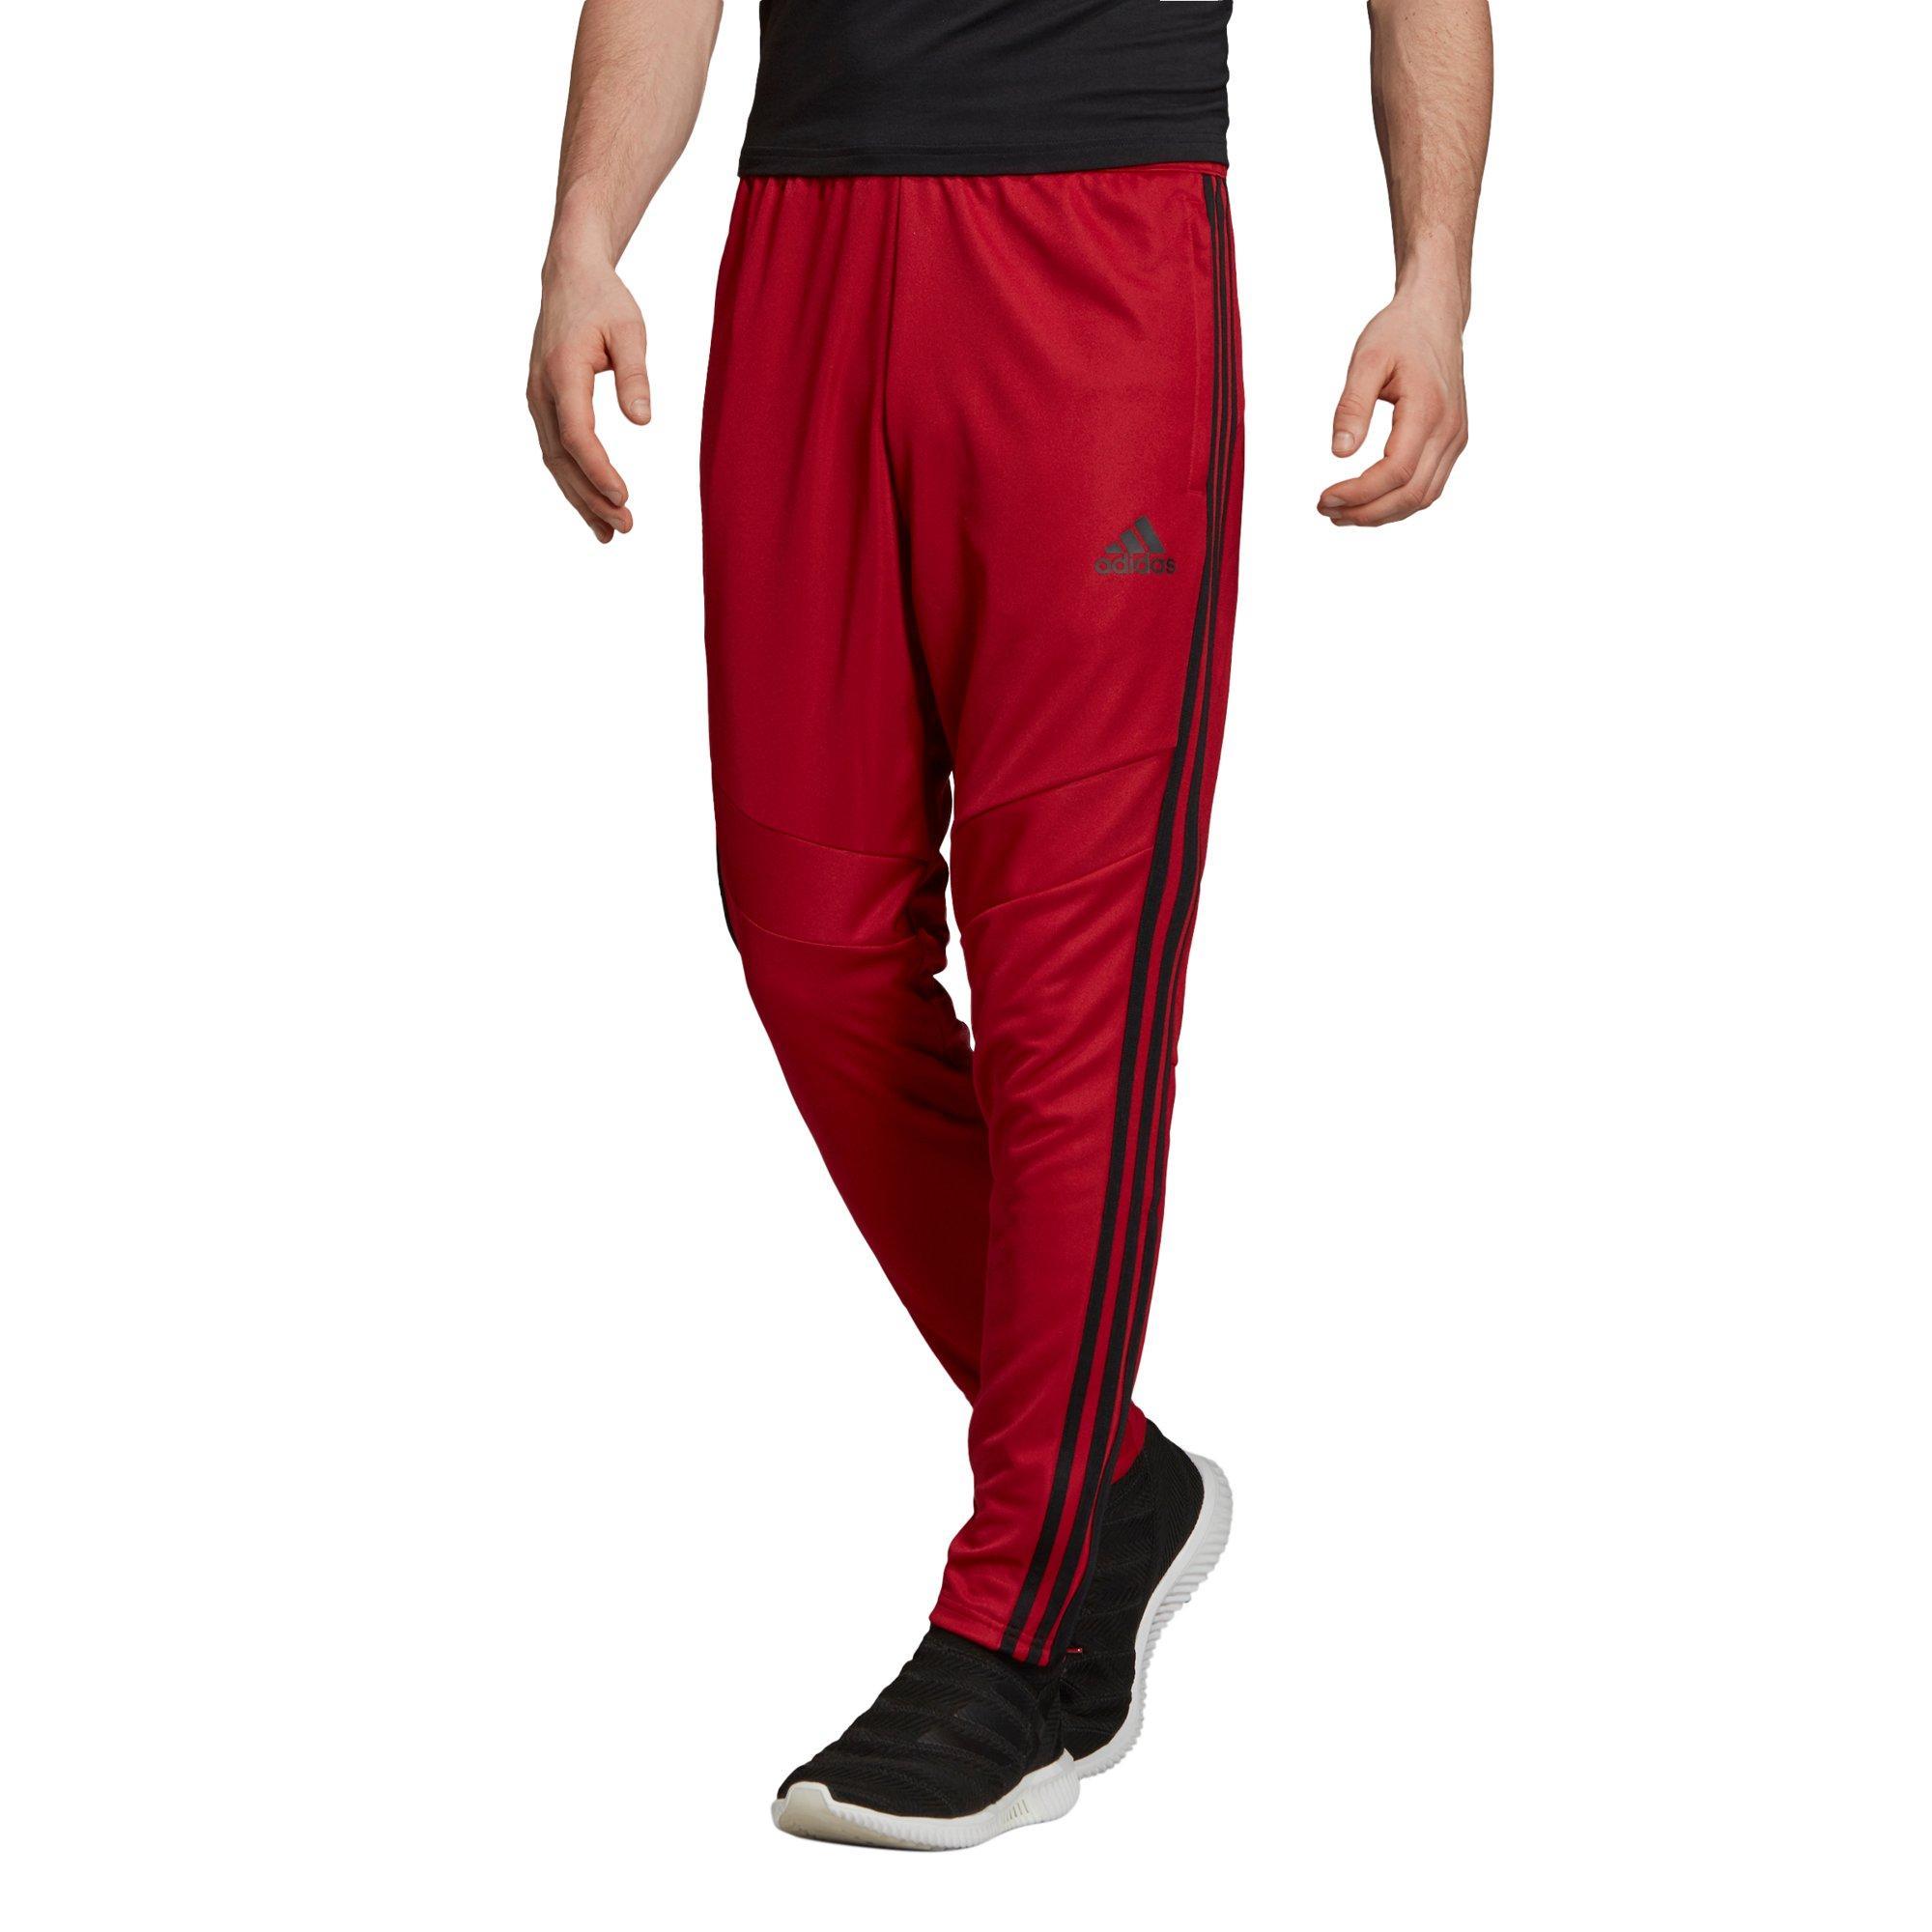 adidas Men's Tiro 19 Pants (maroon) + Free Shipping $16.48